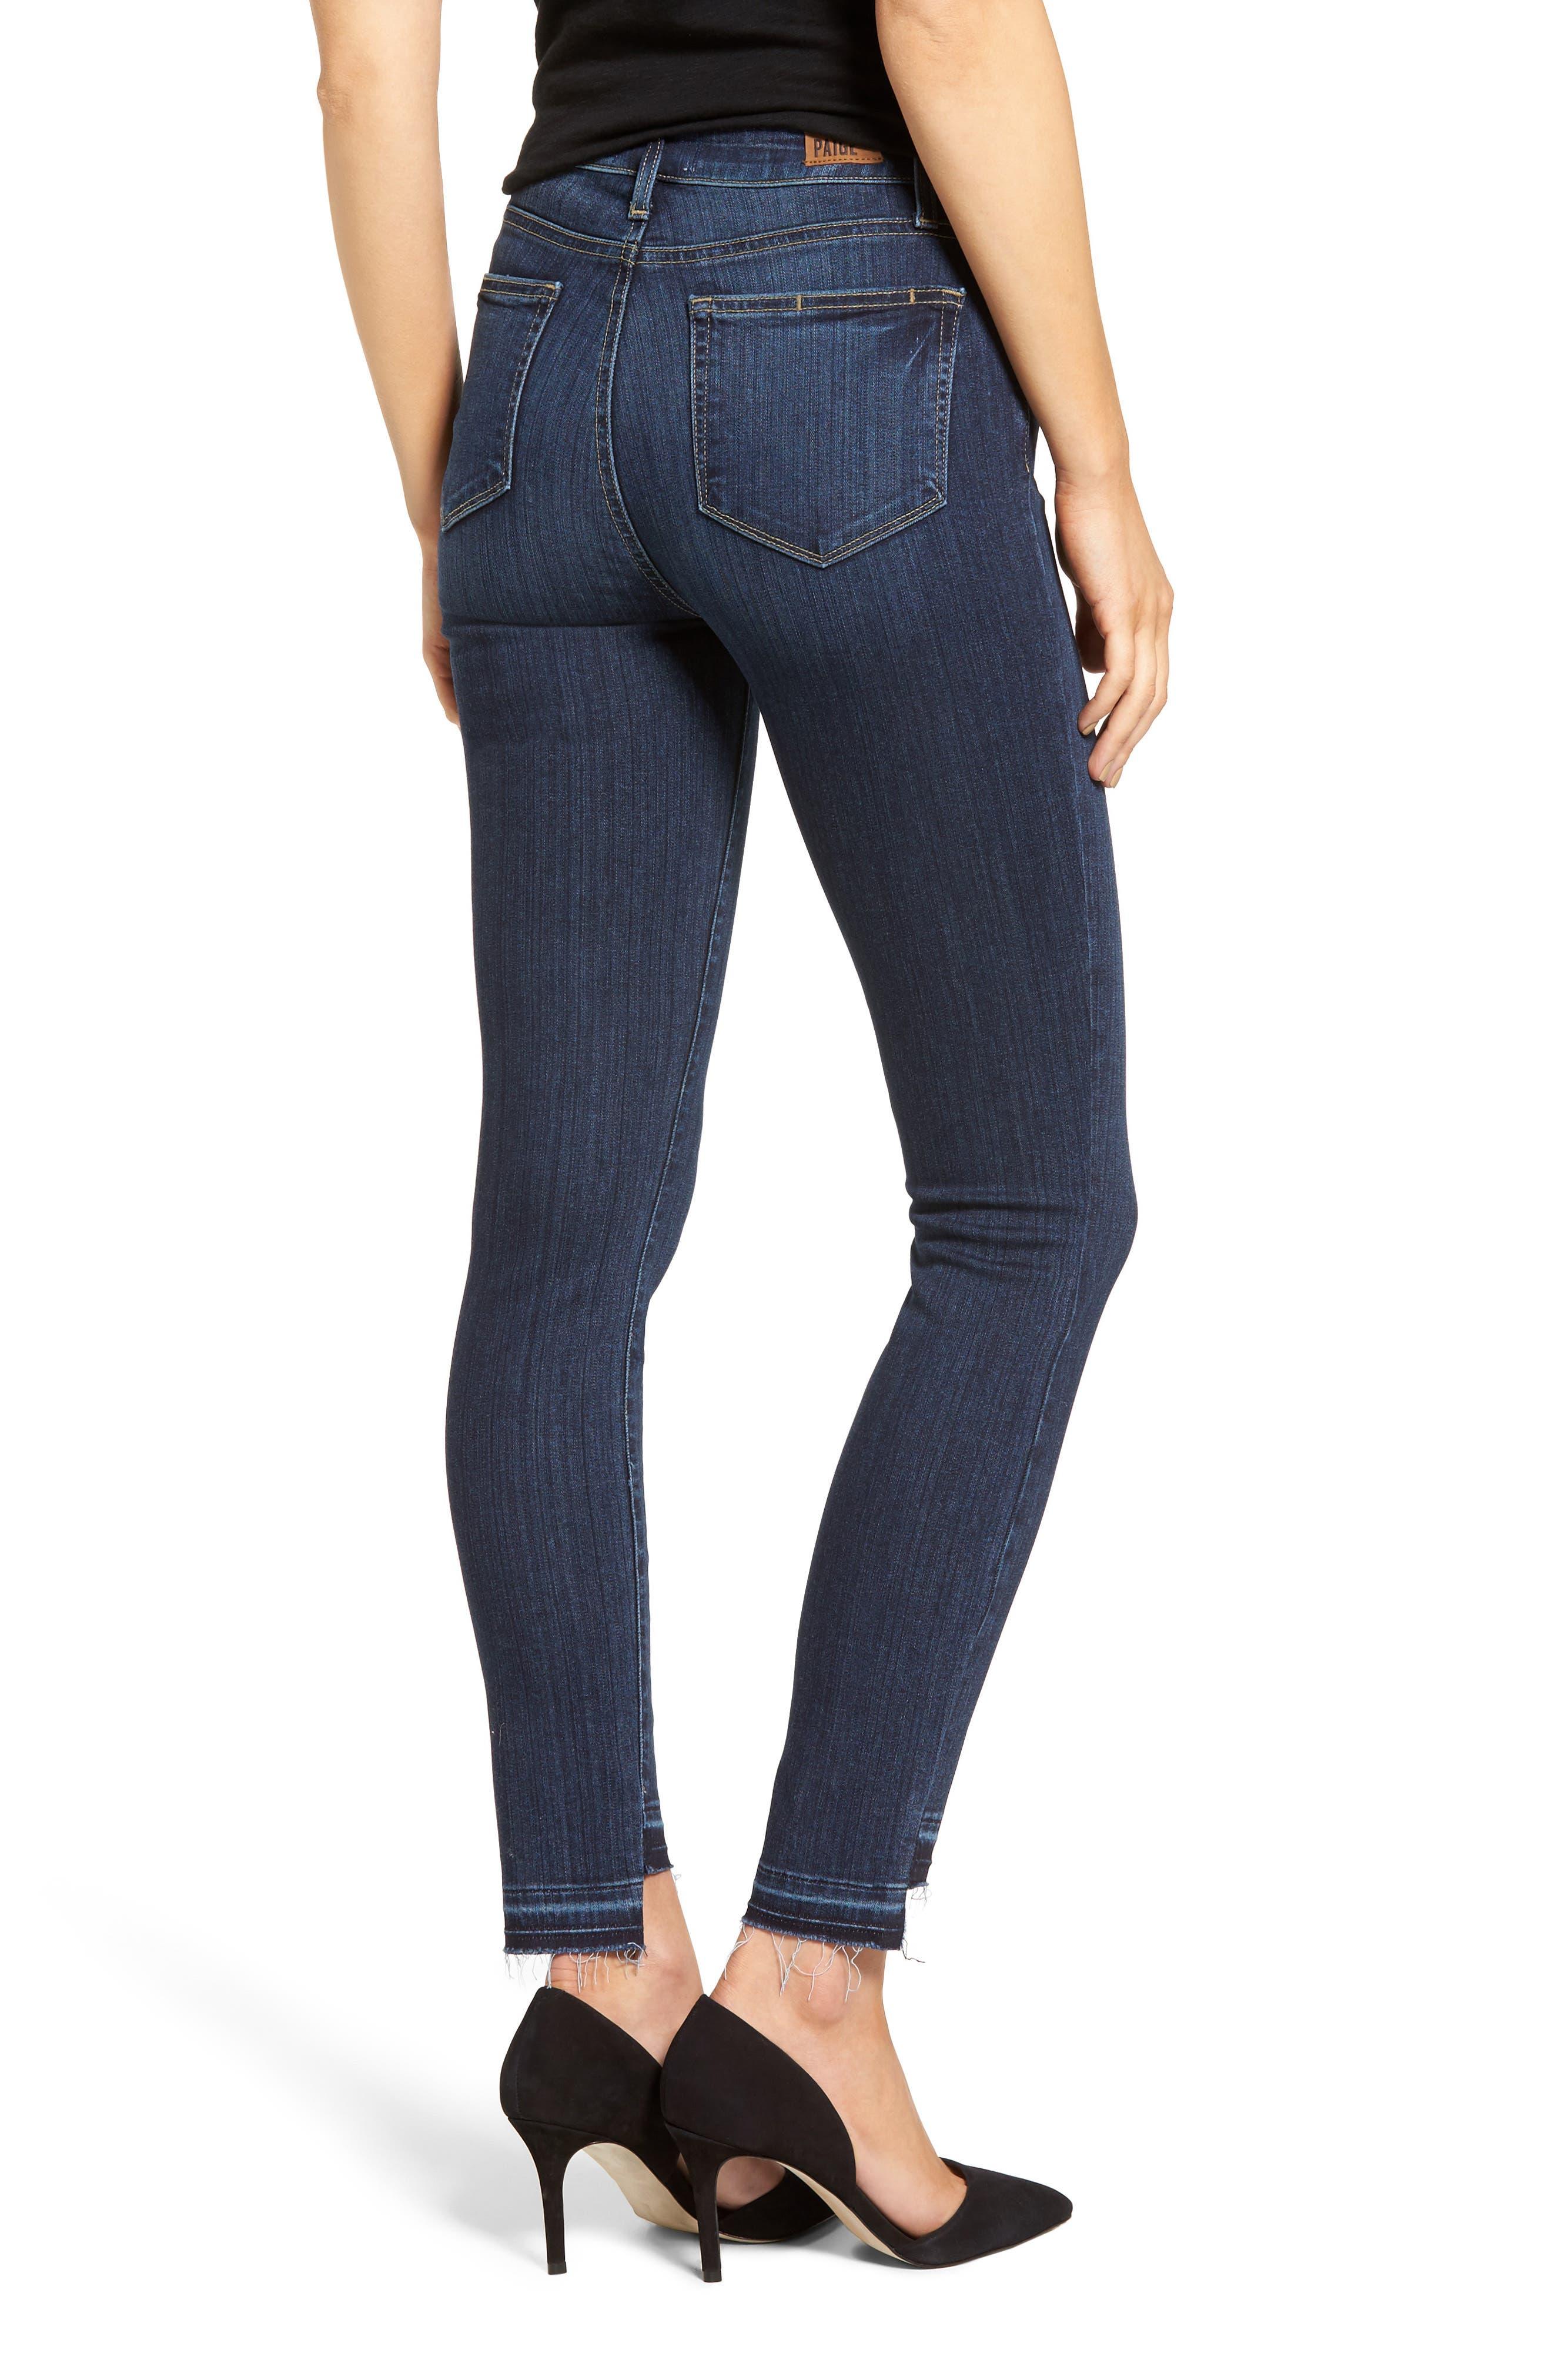 PAIGE, Hoxton High Waist Skinny Jeans, Alternate thumbnail 2, color, 400